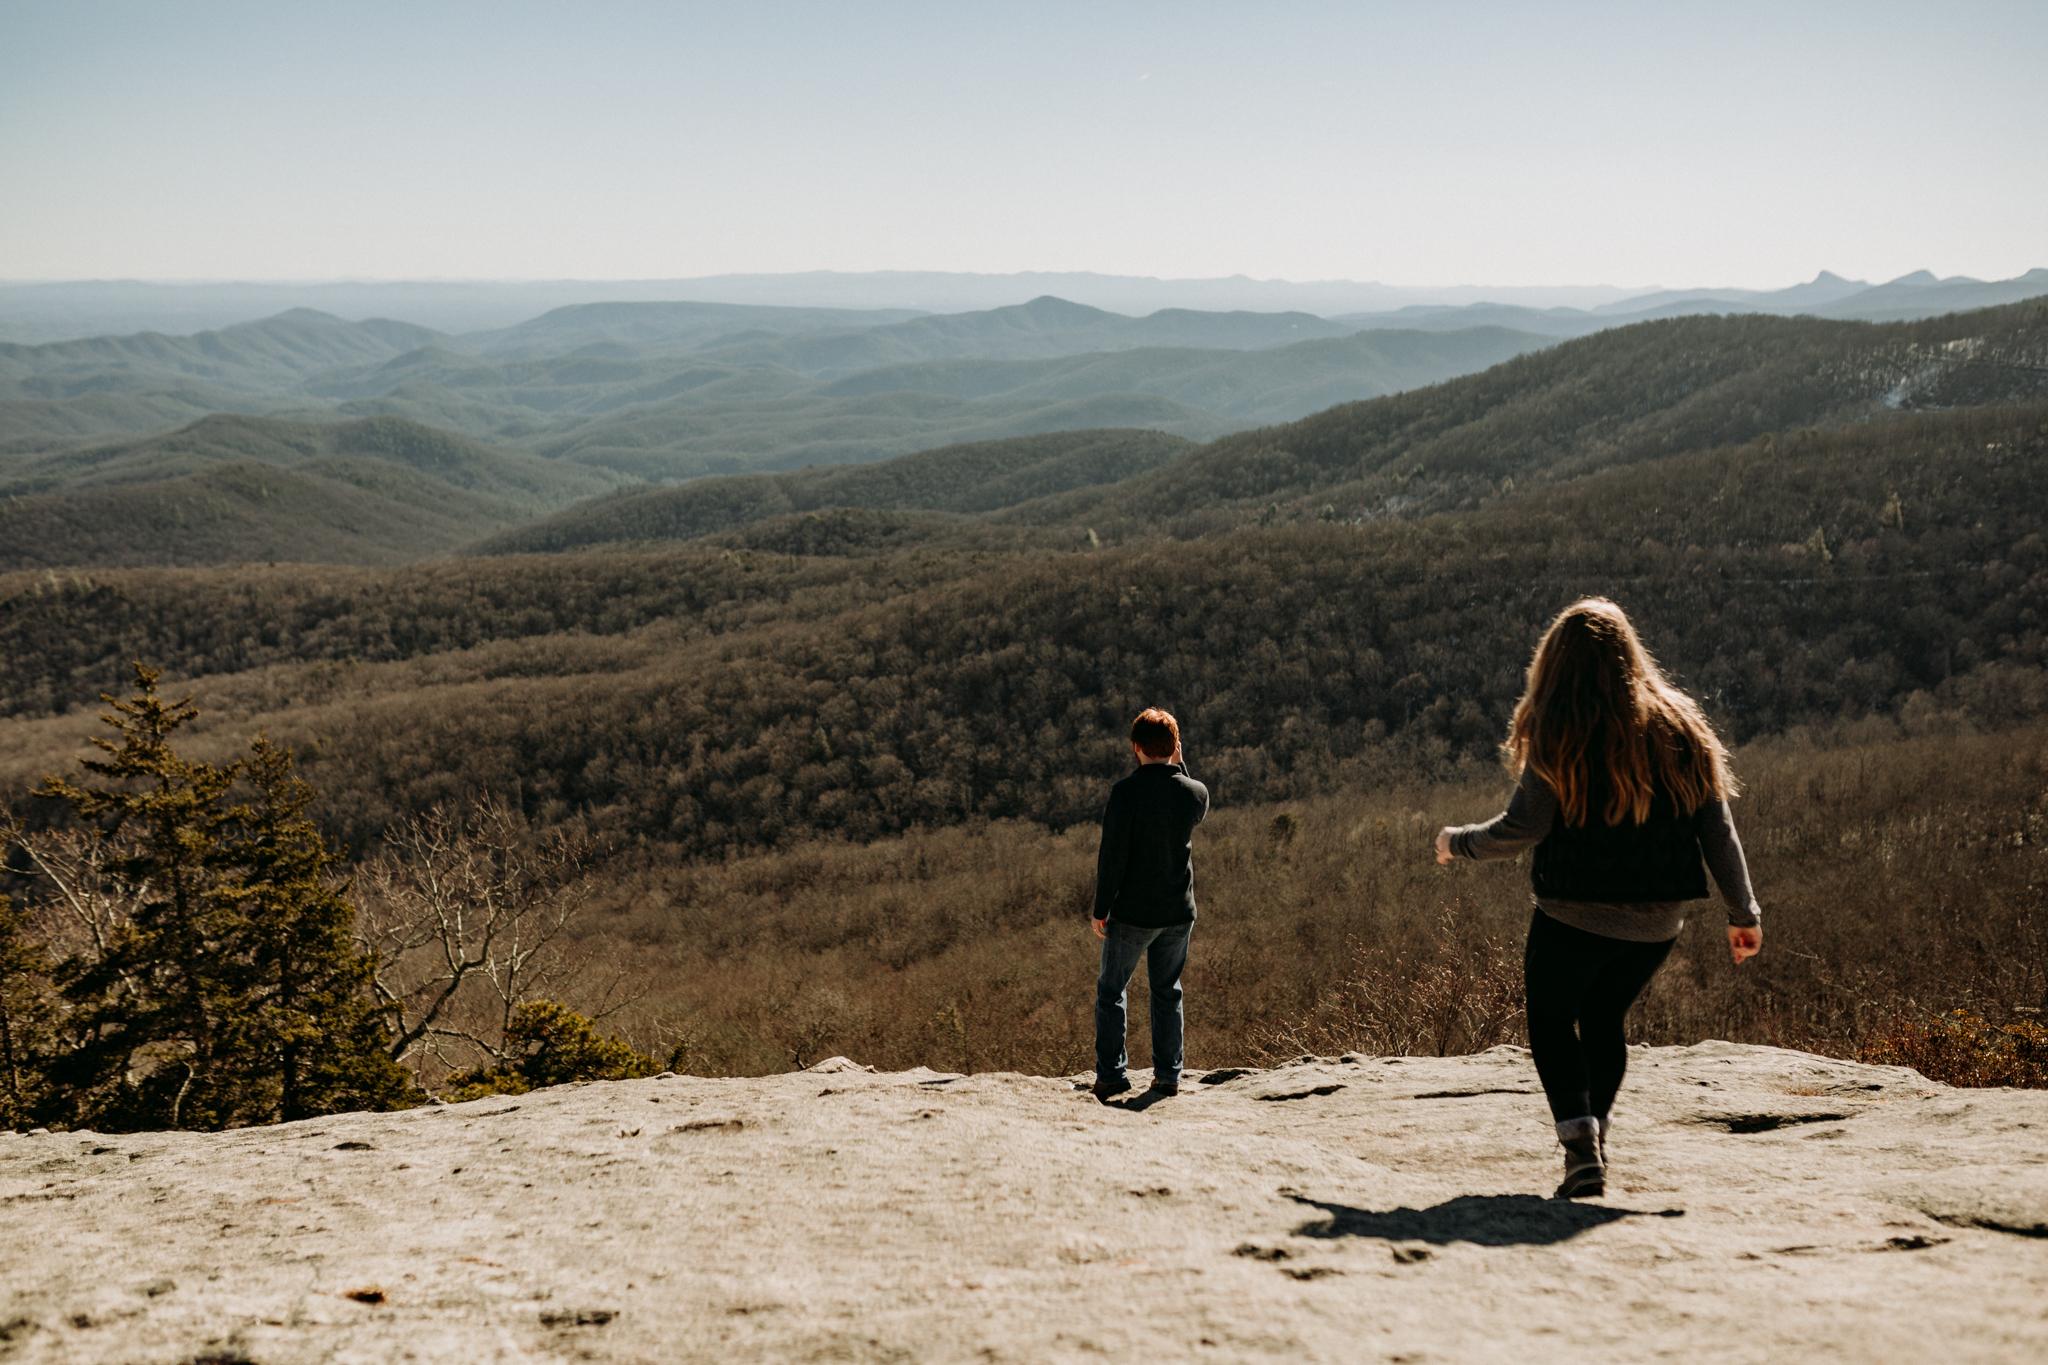 MonicaLeavellPhoto-AshleyMitch-NorthCarolina-Adventure-Engagement-Photographer-2.jpg